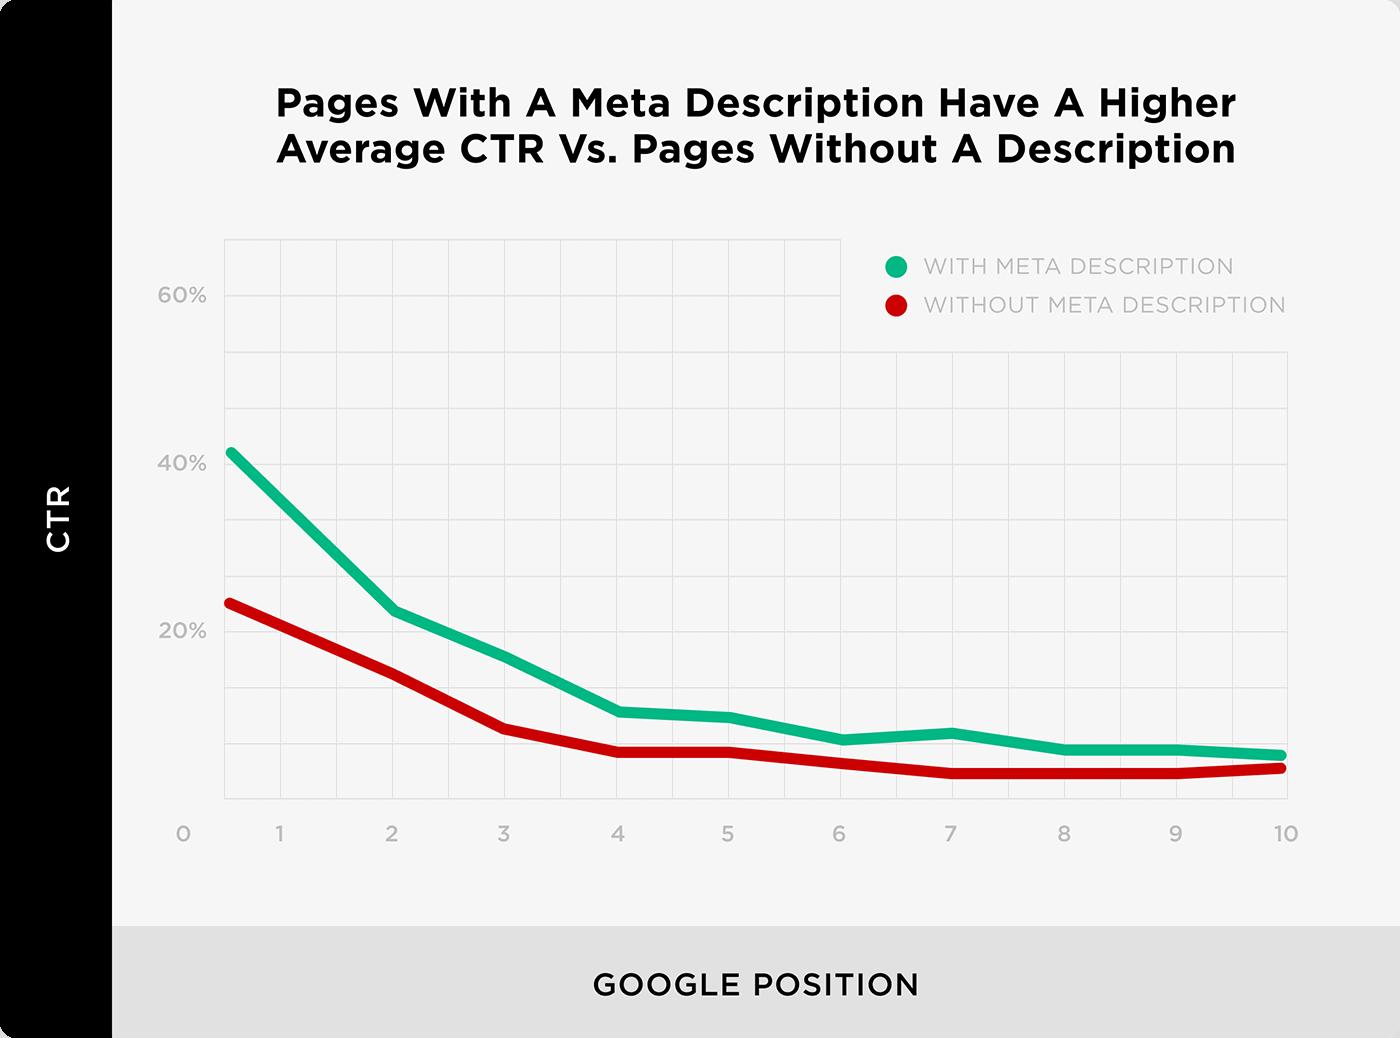 Pages With A Meta Description Have A Higher Average CTR vs. Pages Without A Description